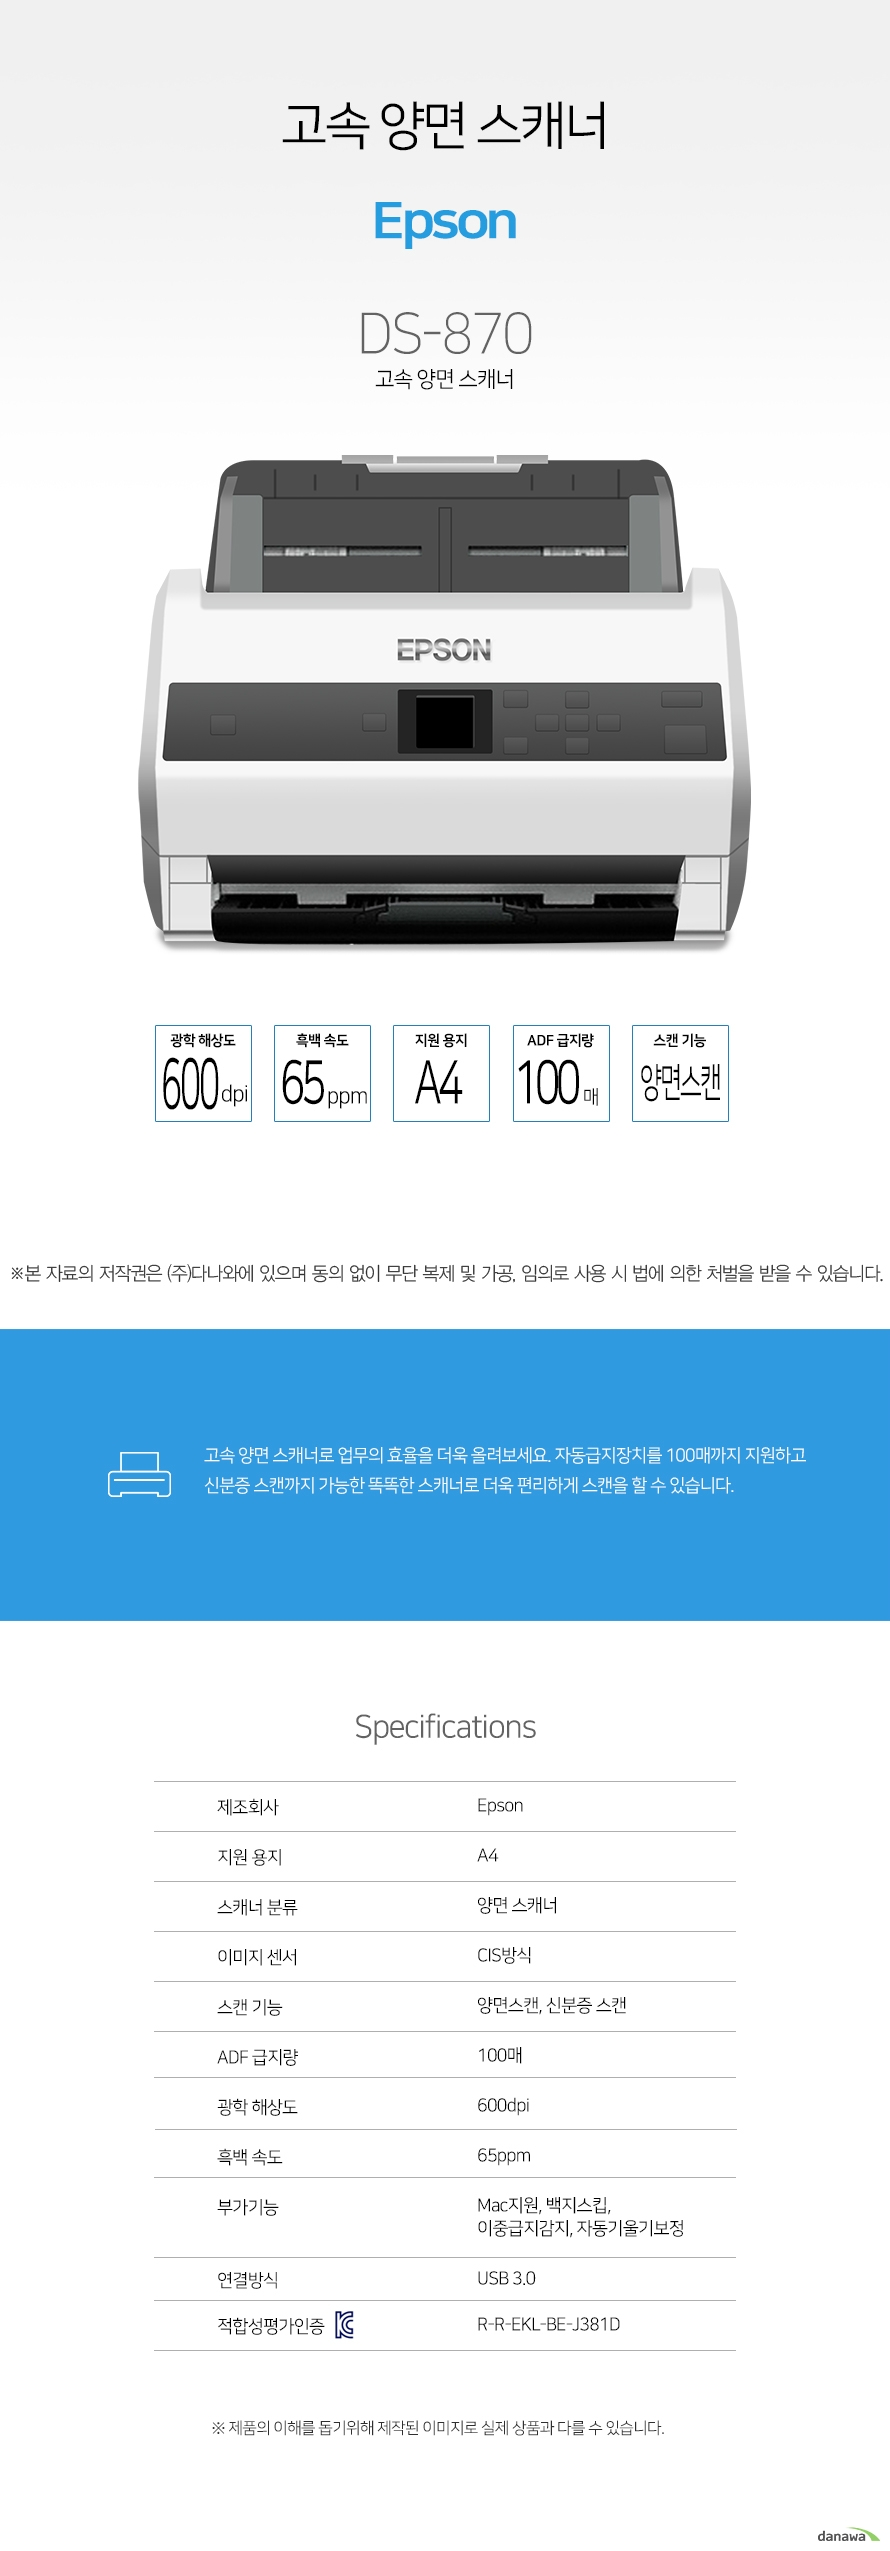 Epson DS-870 / 양면 스캐너 / A4 / CIS 방식 / 스캔 기능: 양면스캔 , 신분증스캔 / 광학 해상도: 600dpi / 흑백 속도: 65ppm / ADF 급지량: 100매 / Mac지원 / 이중급지감지 / 백지스킵 / 자동기울기보정 / 연결방식: USB 3.0 / 네트워크 (옵션) / 크기: 296 x 169 x 167mm / 무게: 약 3.6kg / 양면스캐너는 문서의 양면을 스캔하는 장치를 의미하며, 주로 자동으로 양면을 스캔하는 기기가 많이 이용됩니다. 일부 스캐너에서는 여러개의 문서를 넣어두고 자동으로 문서를 스캔하는 기기도 있습니다.